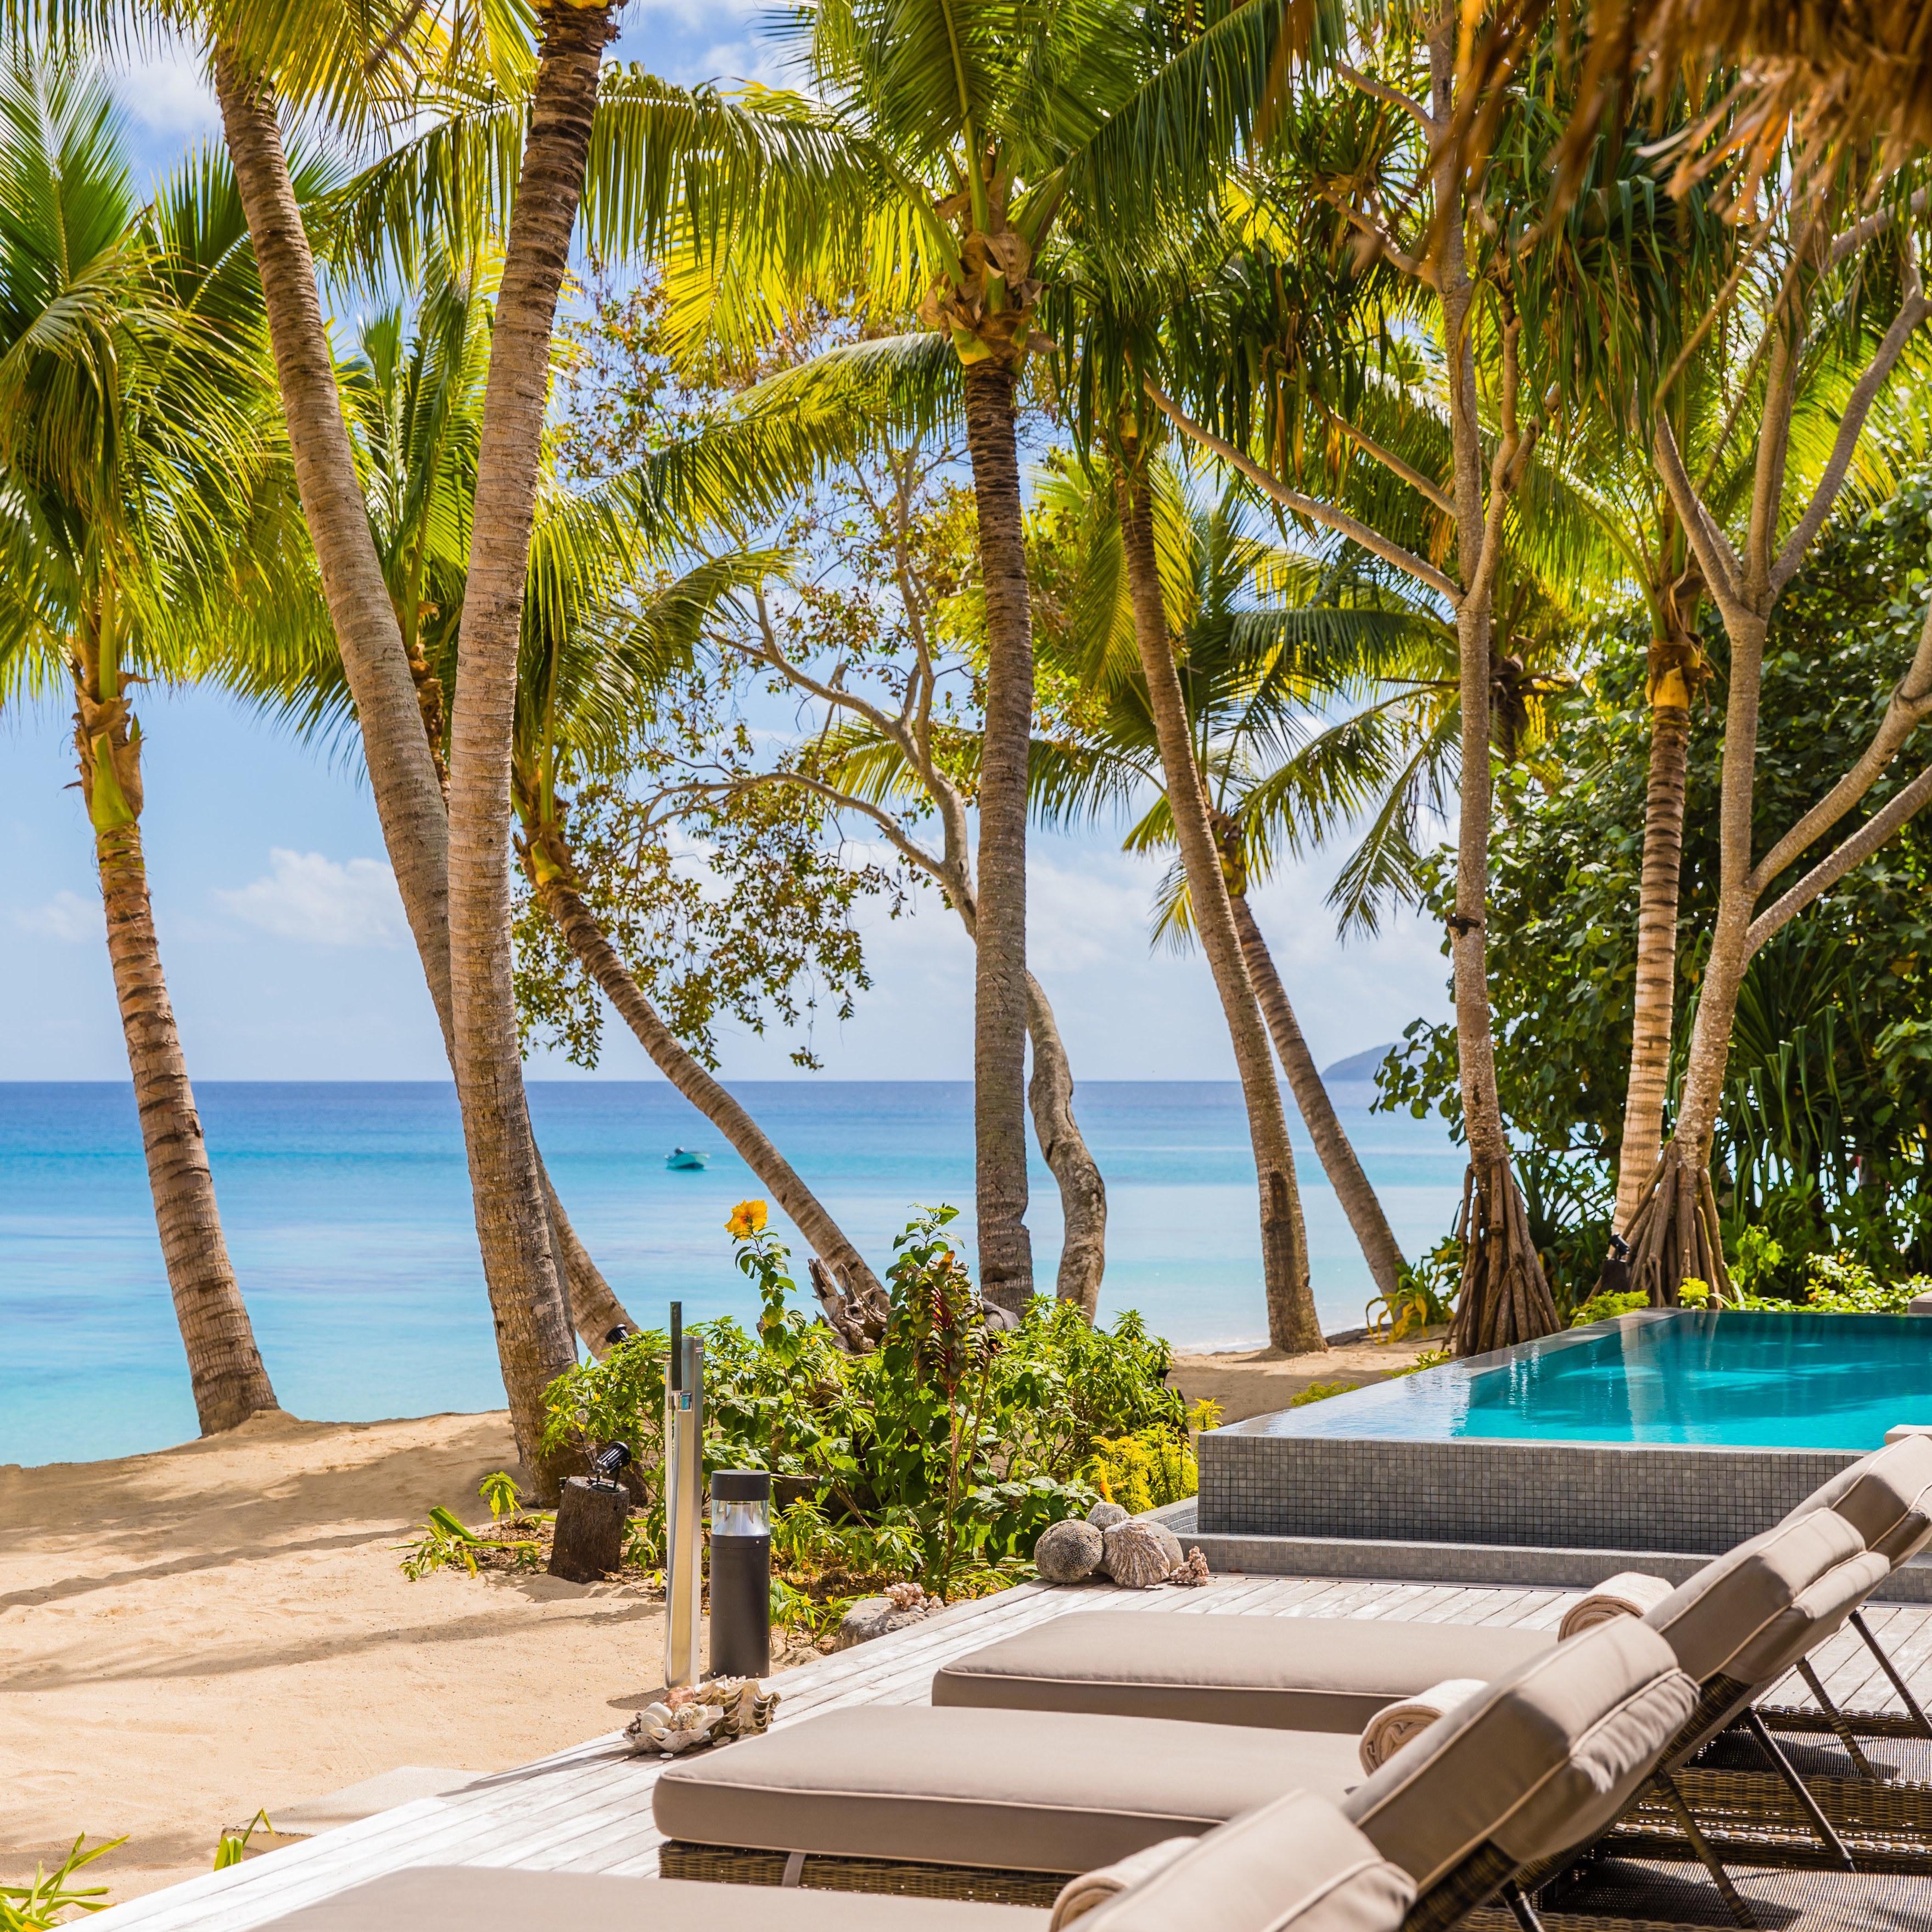 https://www.travelersjoy.com/blog/Fiji-Kokomo-Private-Island-Beachfront-Villa.jpg